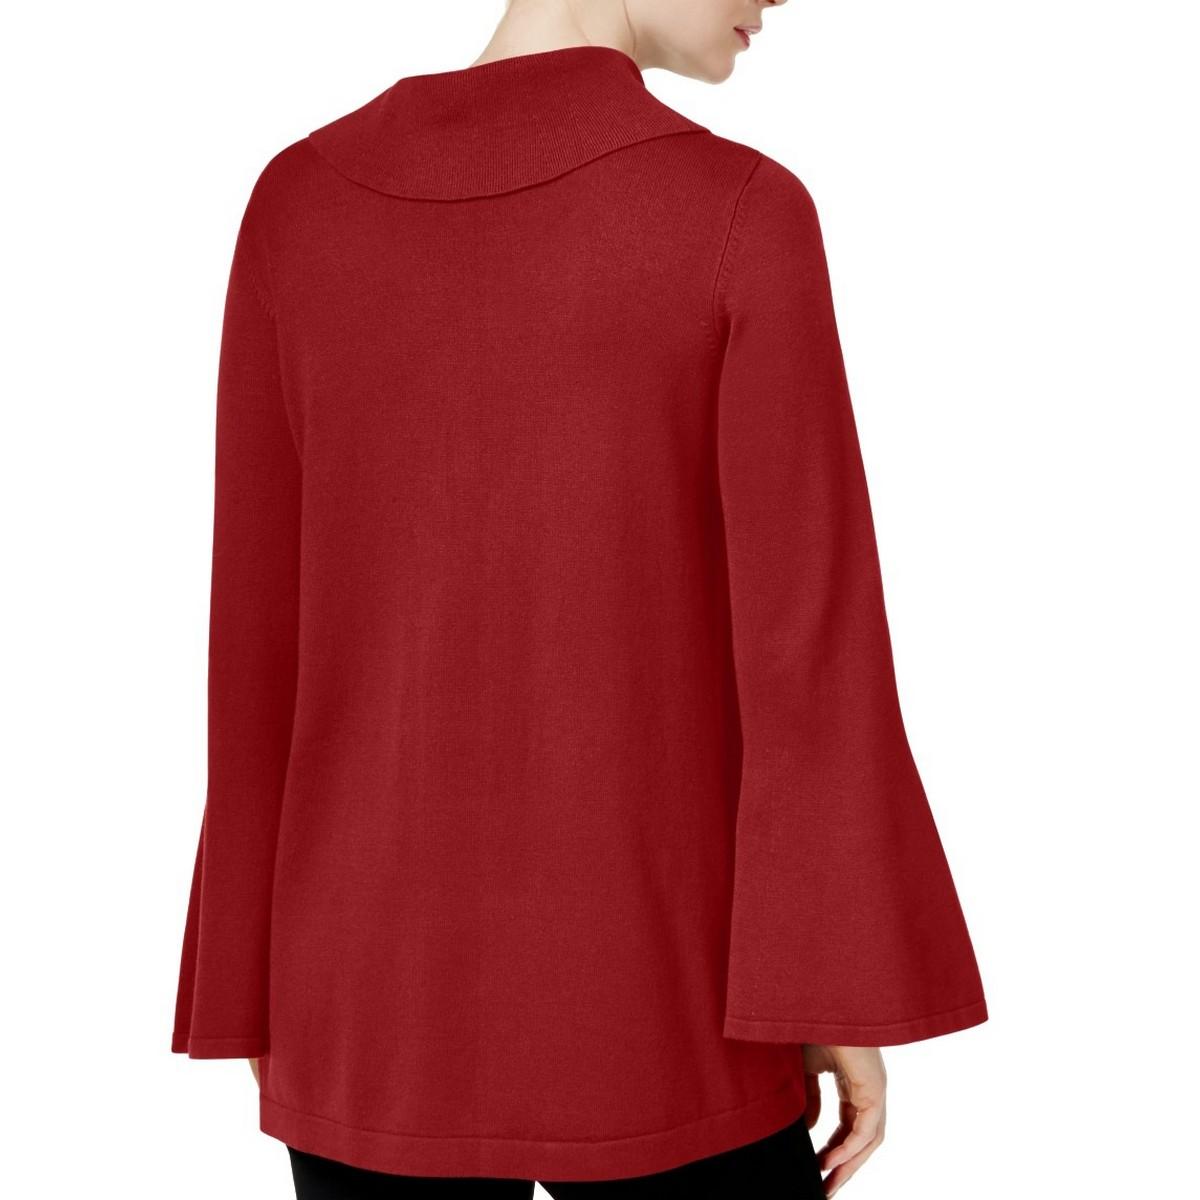 ALFANI-NEW-Women-039-s-Bell-sleeve-Cowl-Neck-Sweater-Top-TEDO thumbnail 9